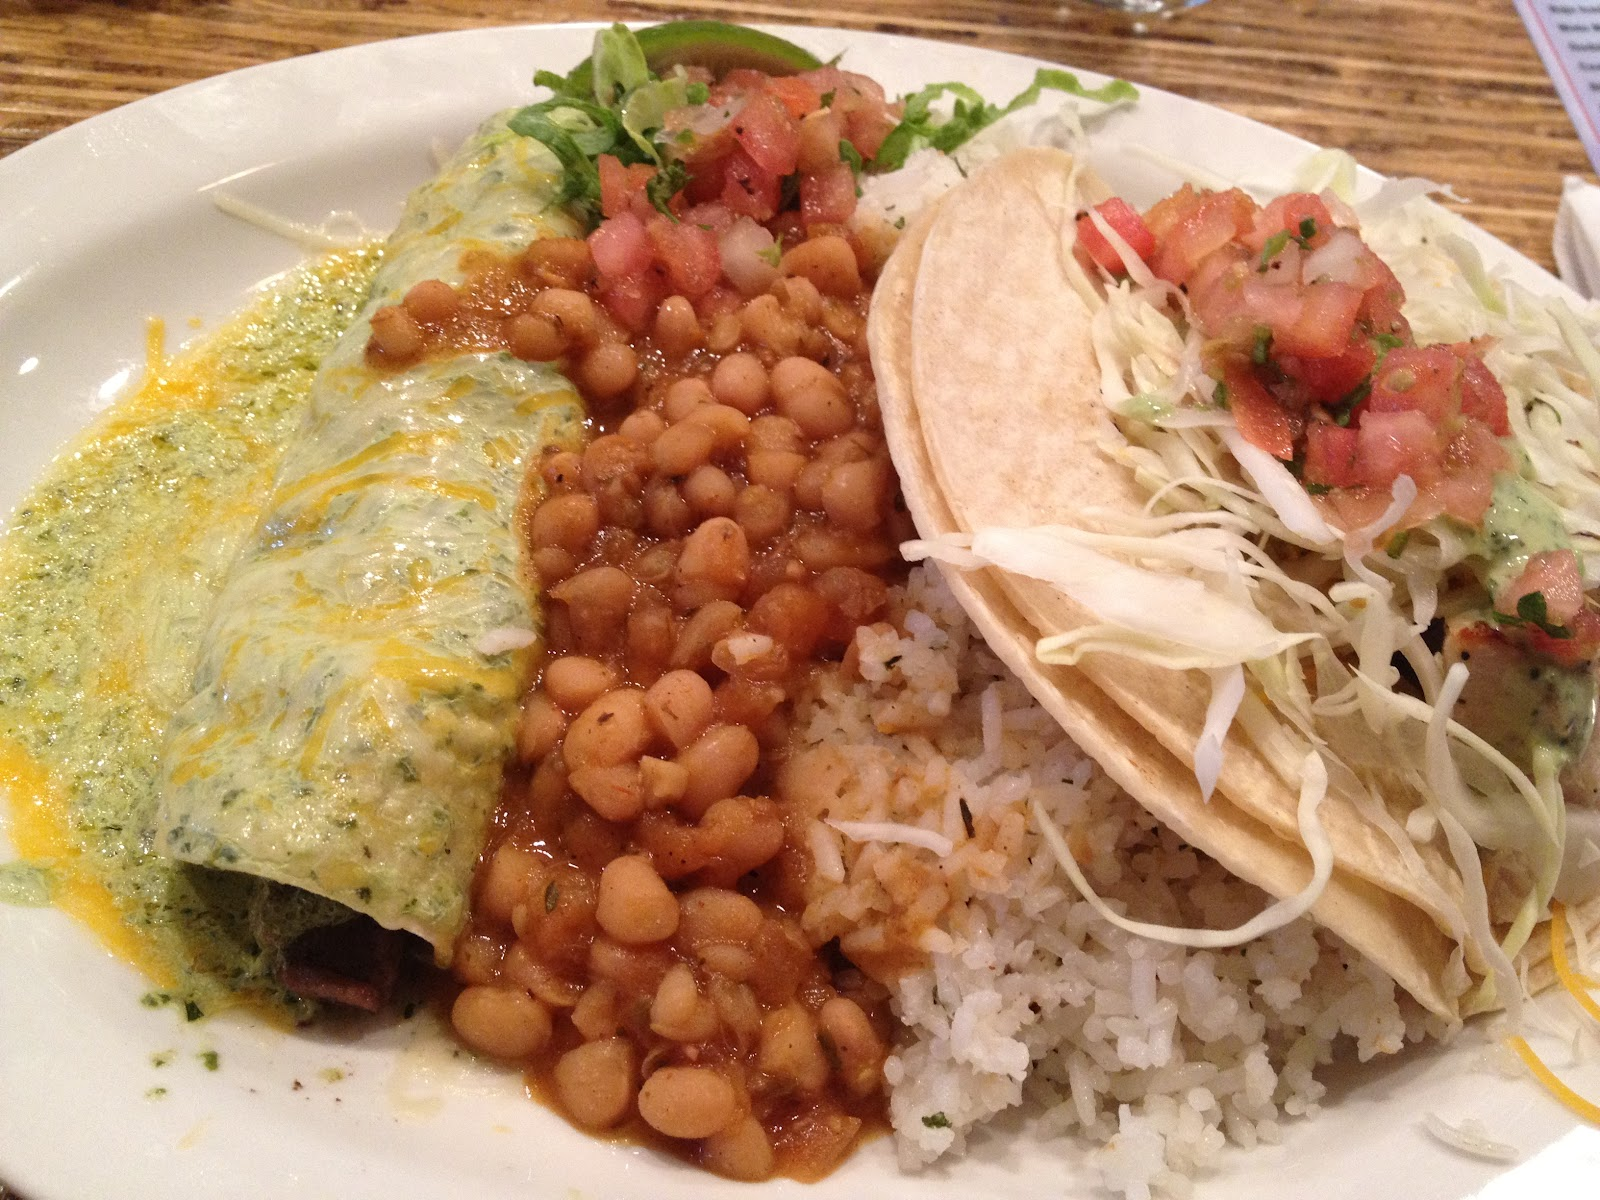 Wahoo s fish taco opens in nyc dee cuisine we blog for Wahoo fish taco